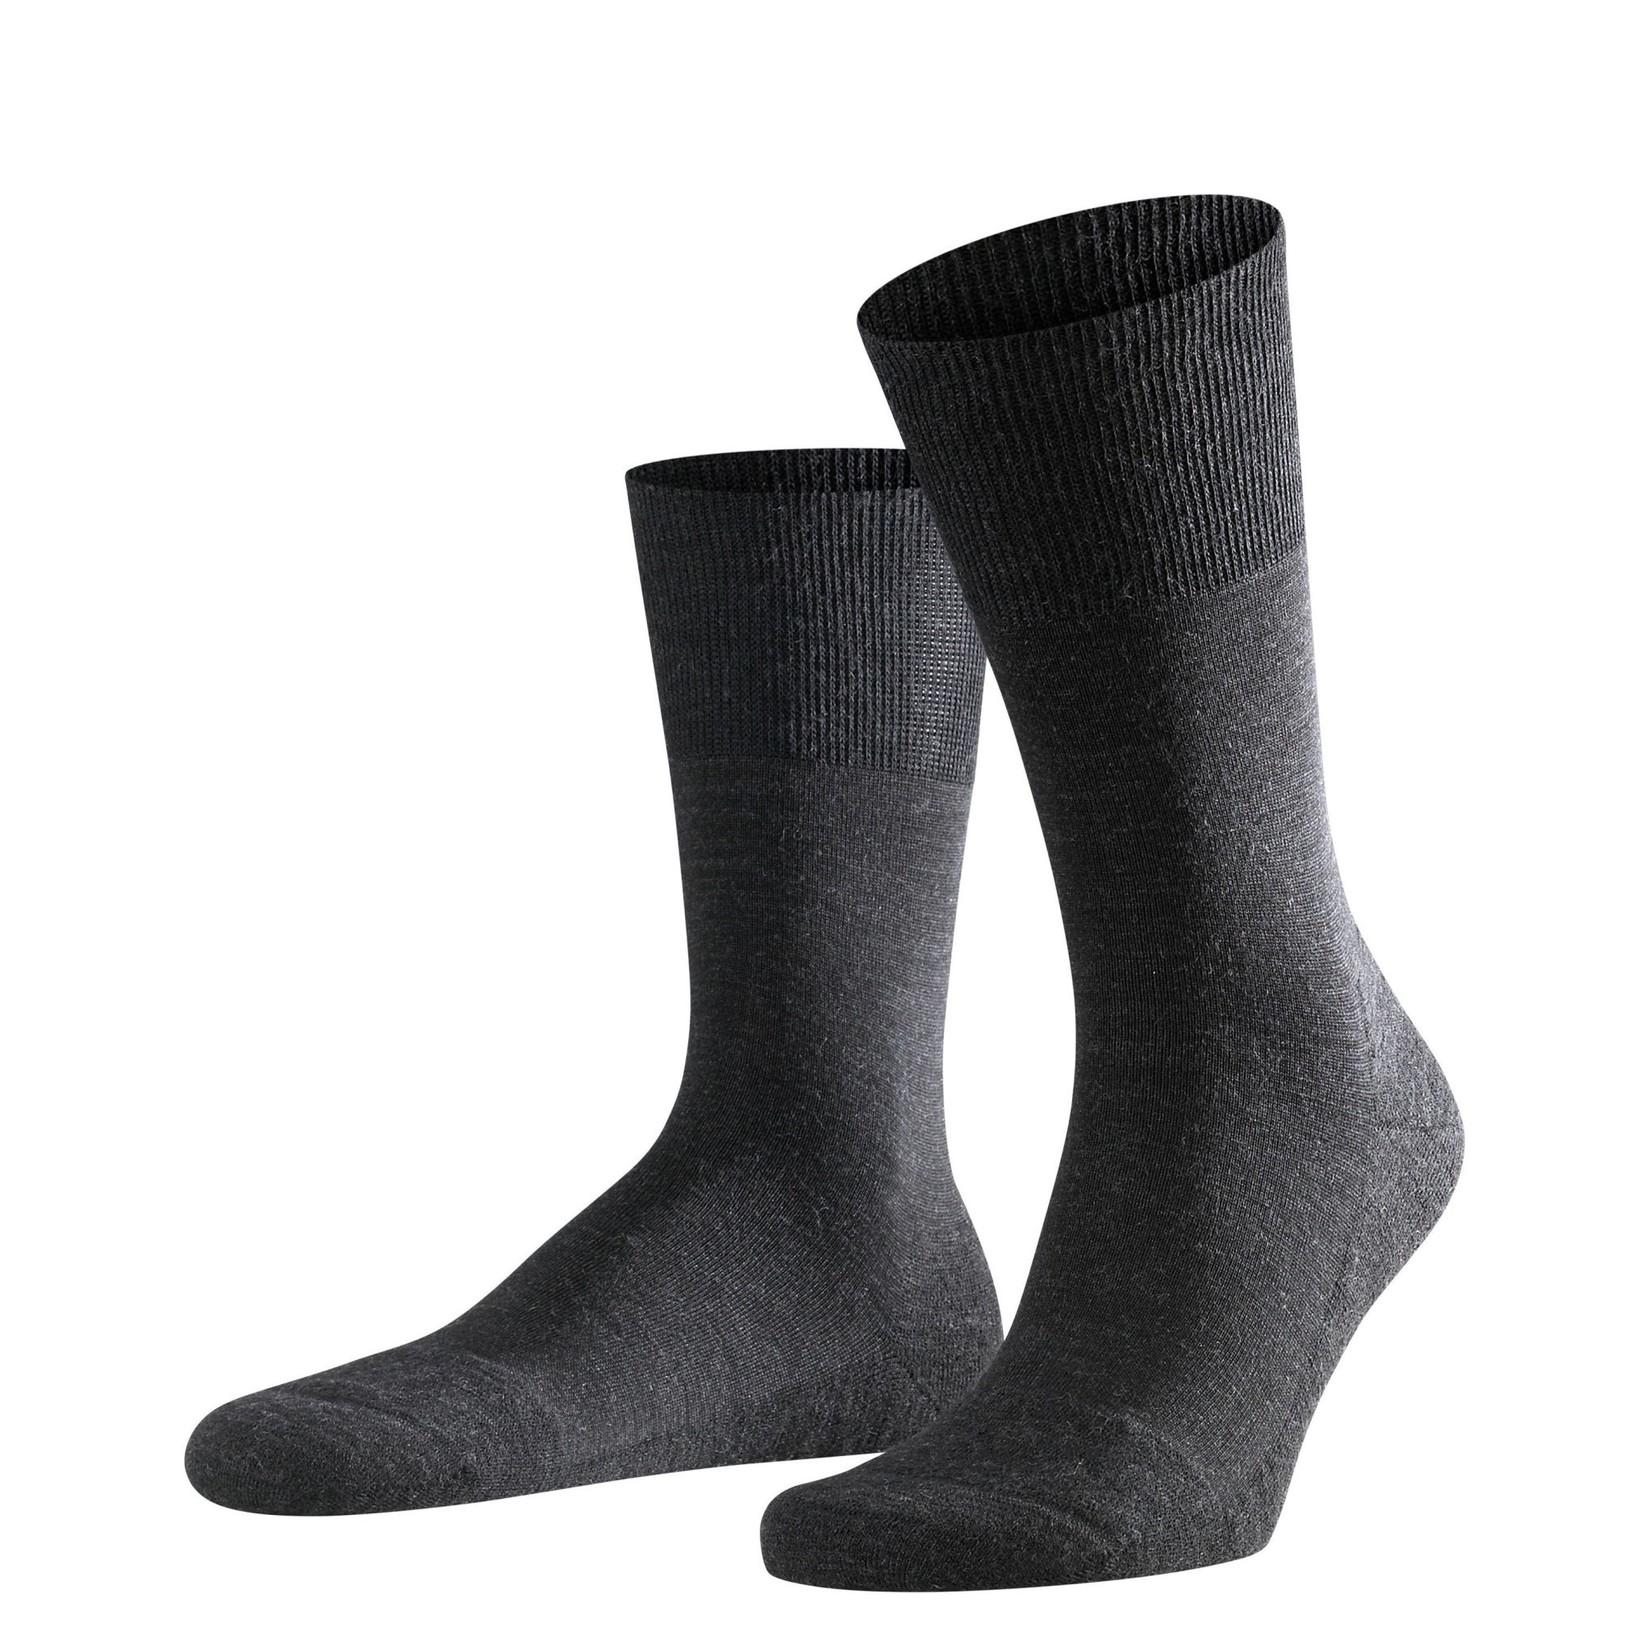 Falke Airport Plus sokken antraciet melange